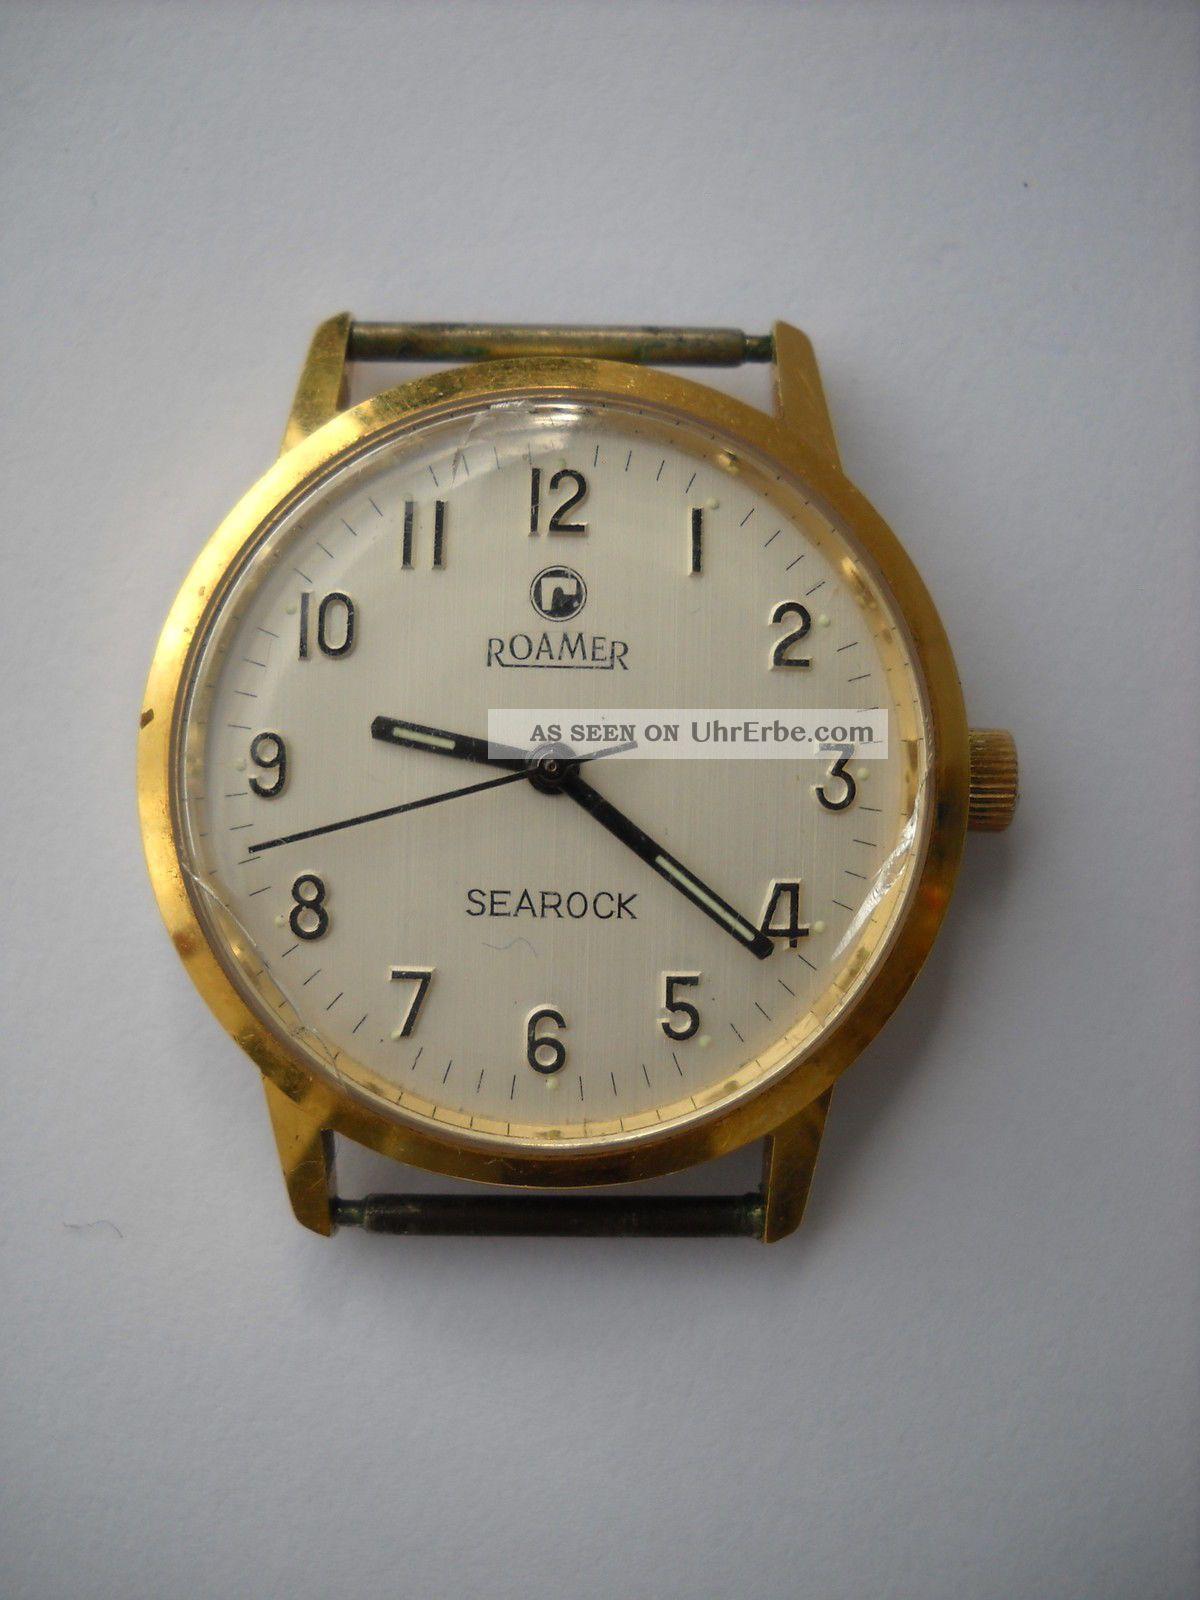 Roamer Searock,  Armbanduhr,  Handaufzug,  Vergoldet,  Kaliber 43/mst 521,  Sammleruhr Armbanduhren Bild